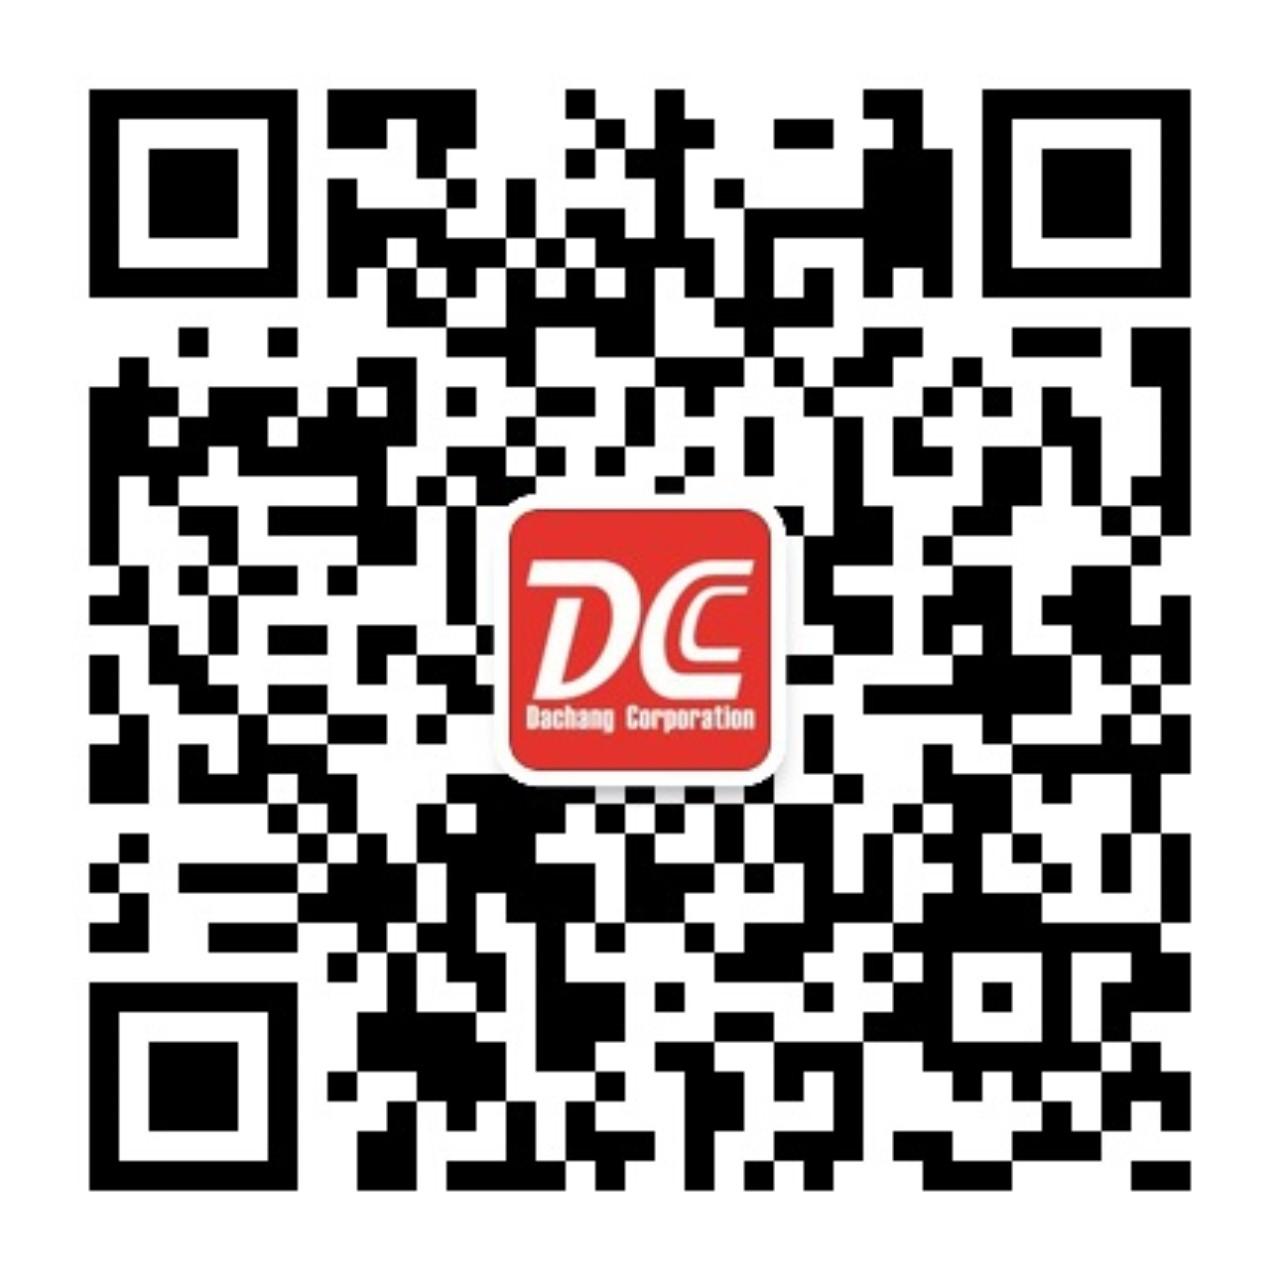 微信号:http://www.audio160.com/upfiles/wx/2016117111817.jpg